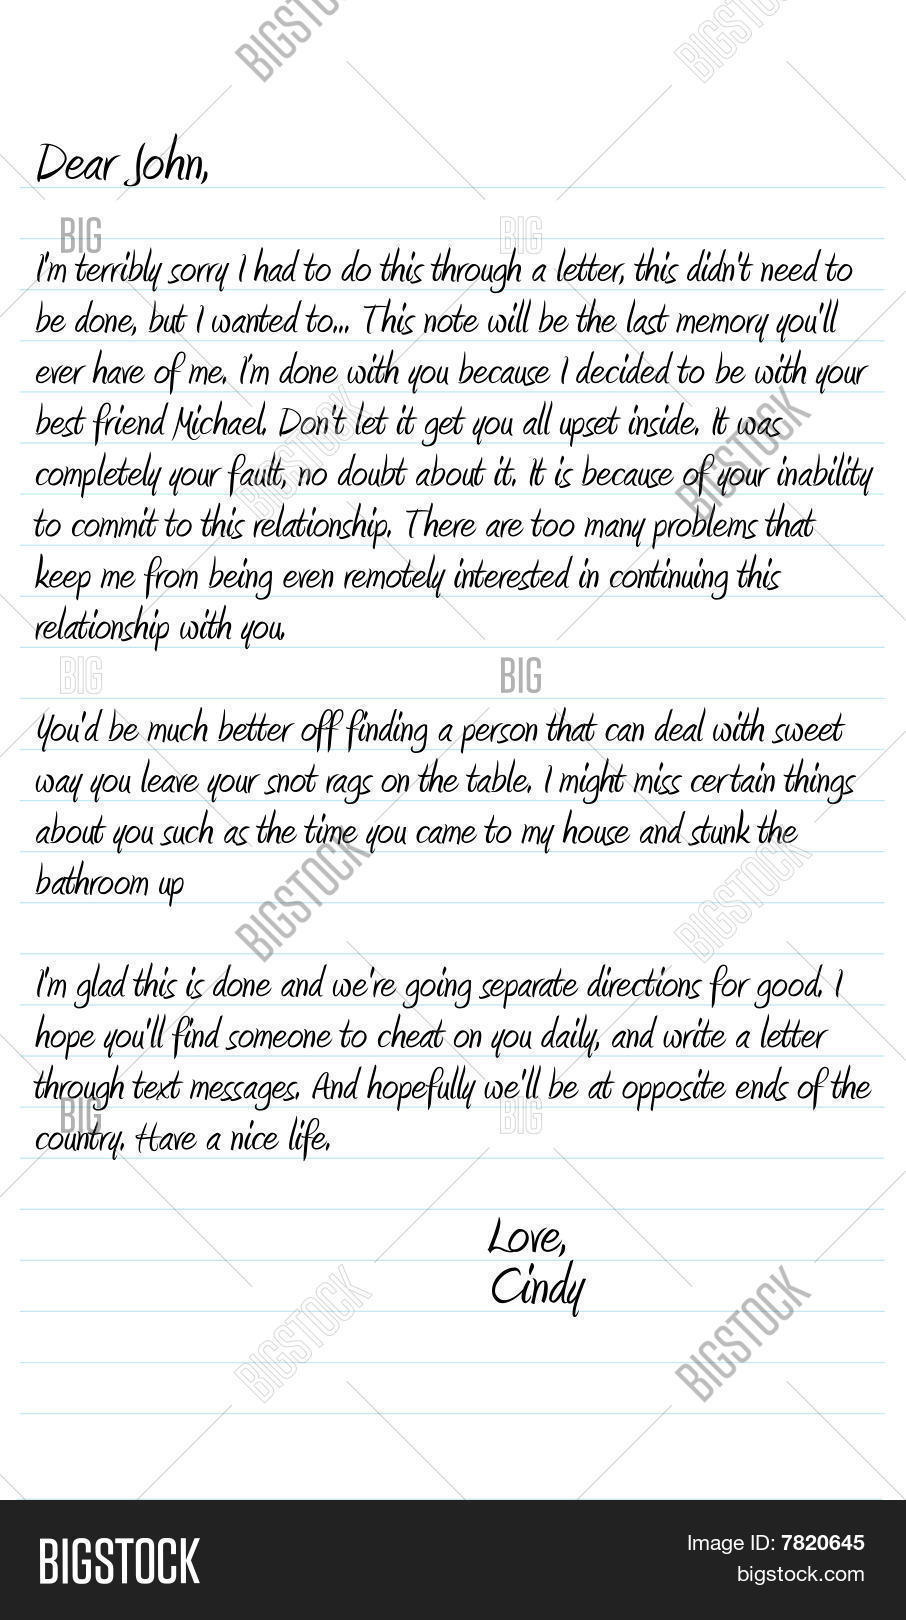 Dear John Letter Vector & Photo (Free Trial) | Bigstock